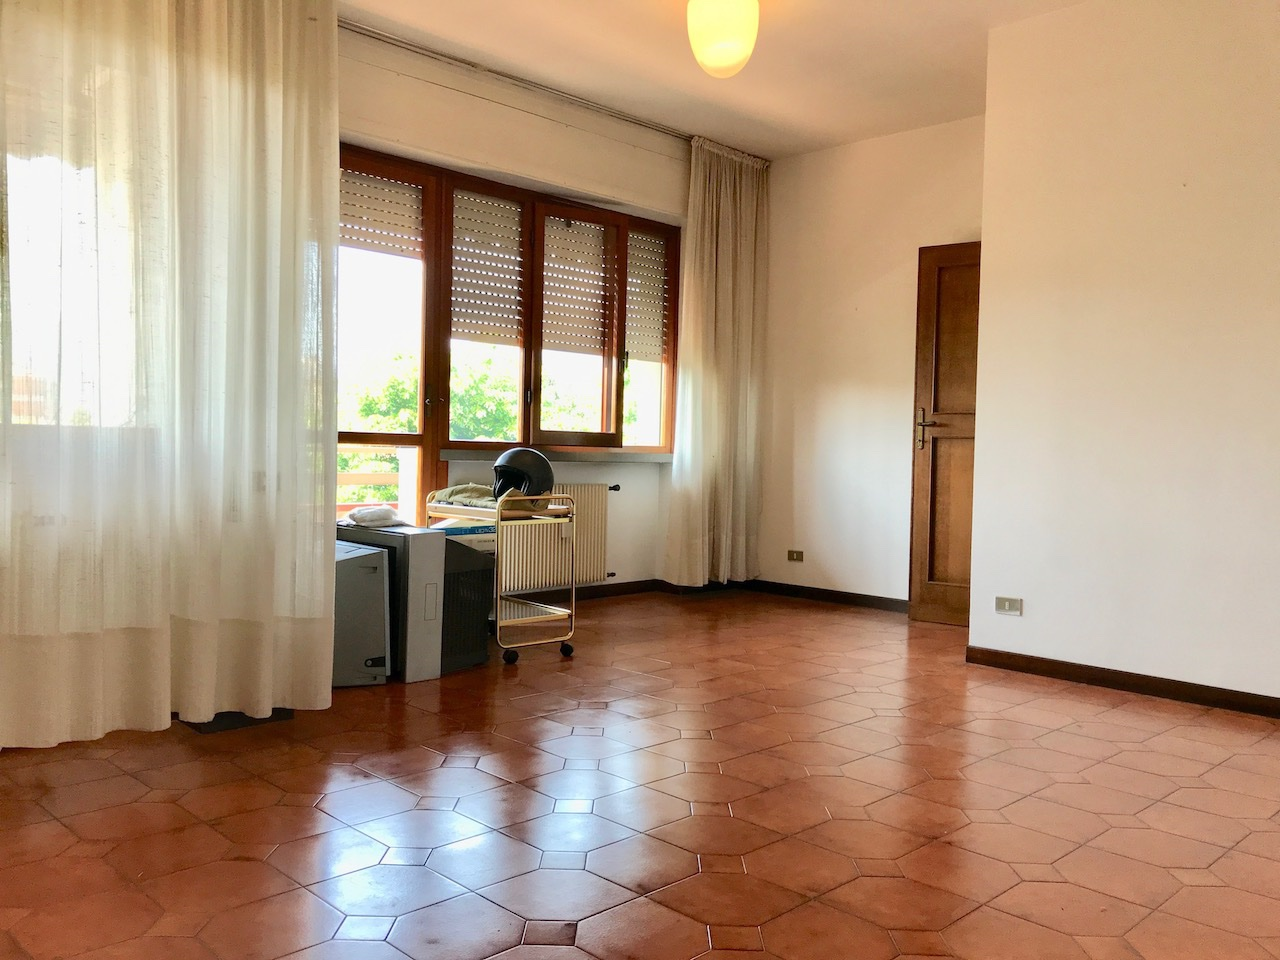 Appartamento in vendita, rif. LOG-201